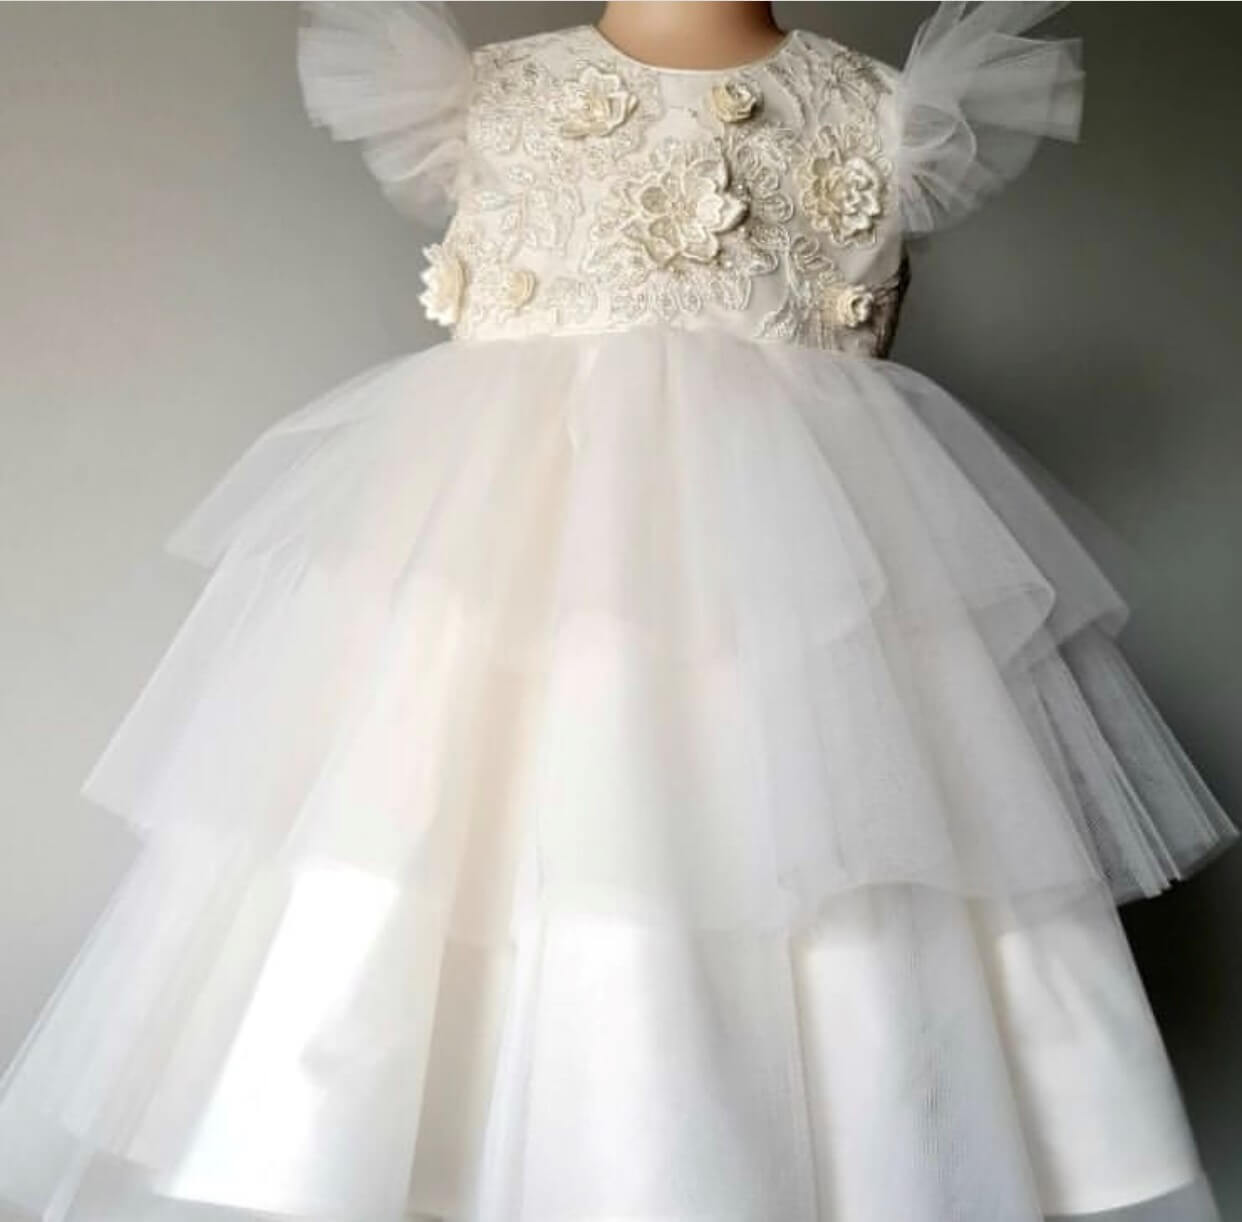 3 Layer Length Tulle Dress PP